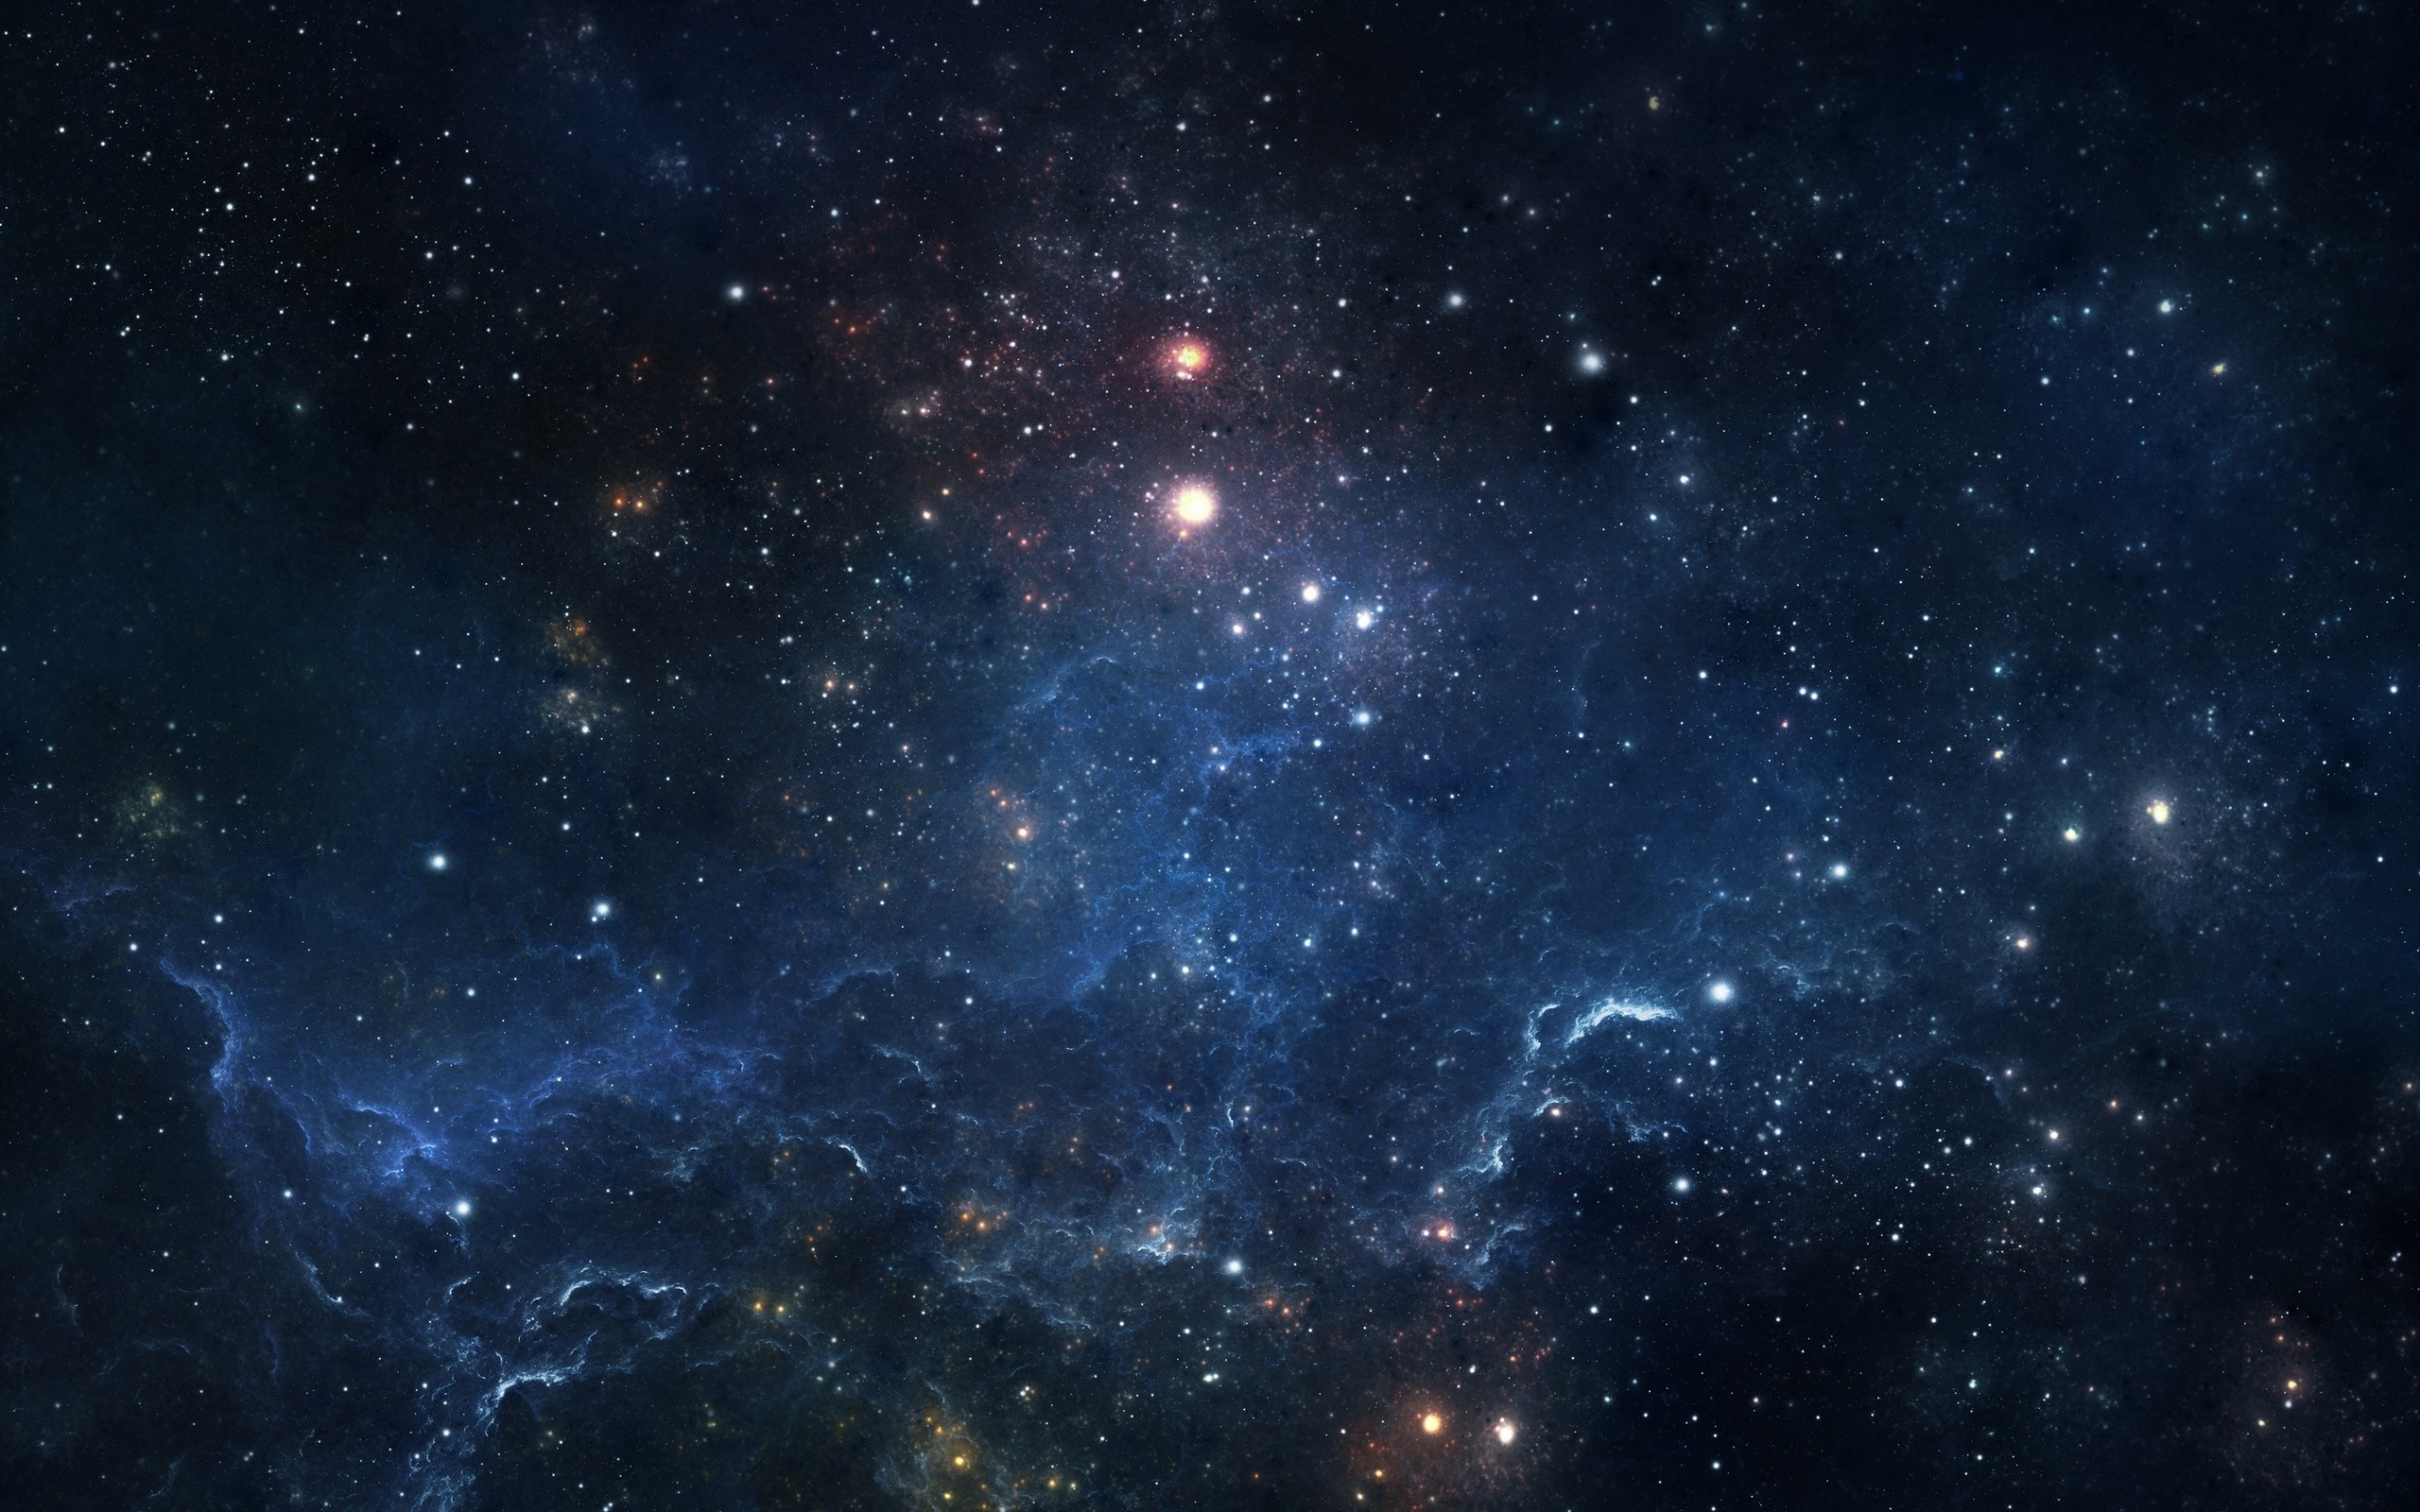 Stars space nebula wallpaper 2560x1600 136960 WallpaperUP 2560x1600